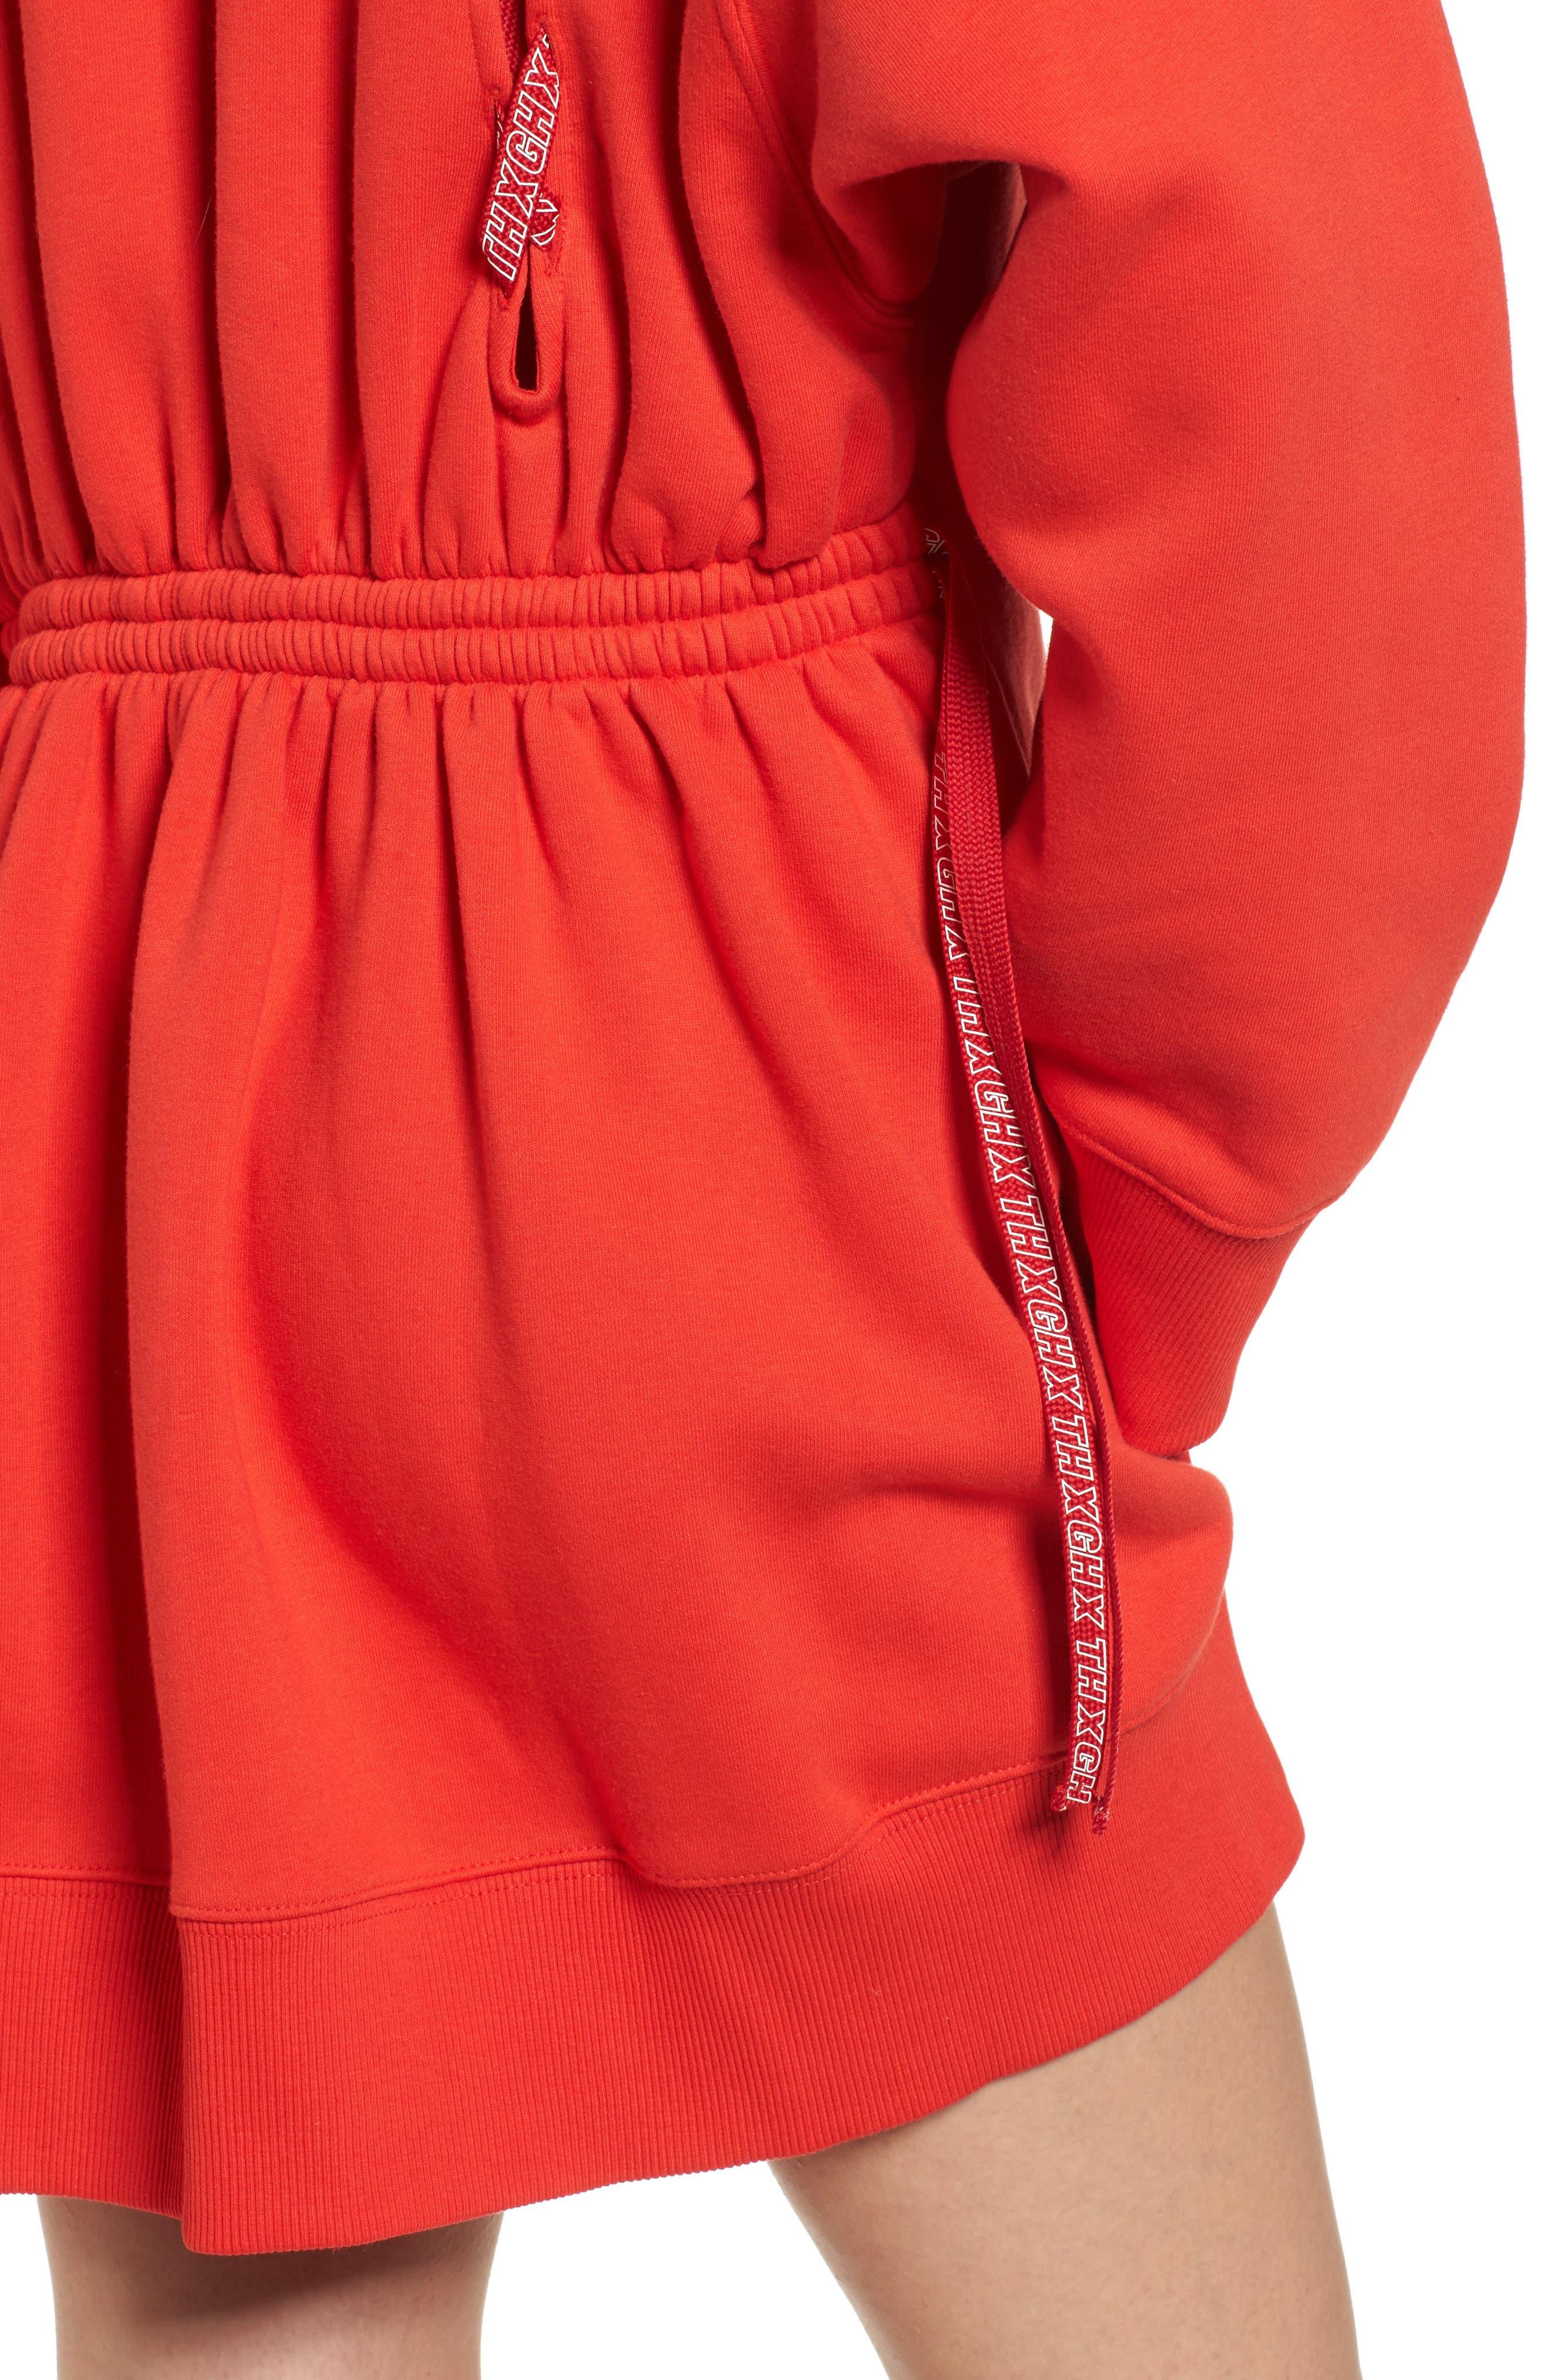 x Gigi Hadid Sweatshirt Dress,                             Alternate thumbnail 4, color,                             Flame Scarlet